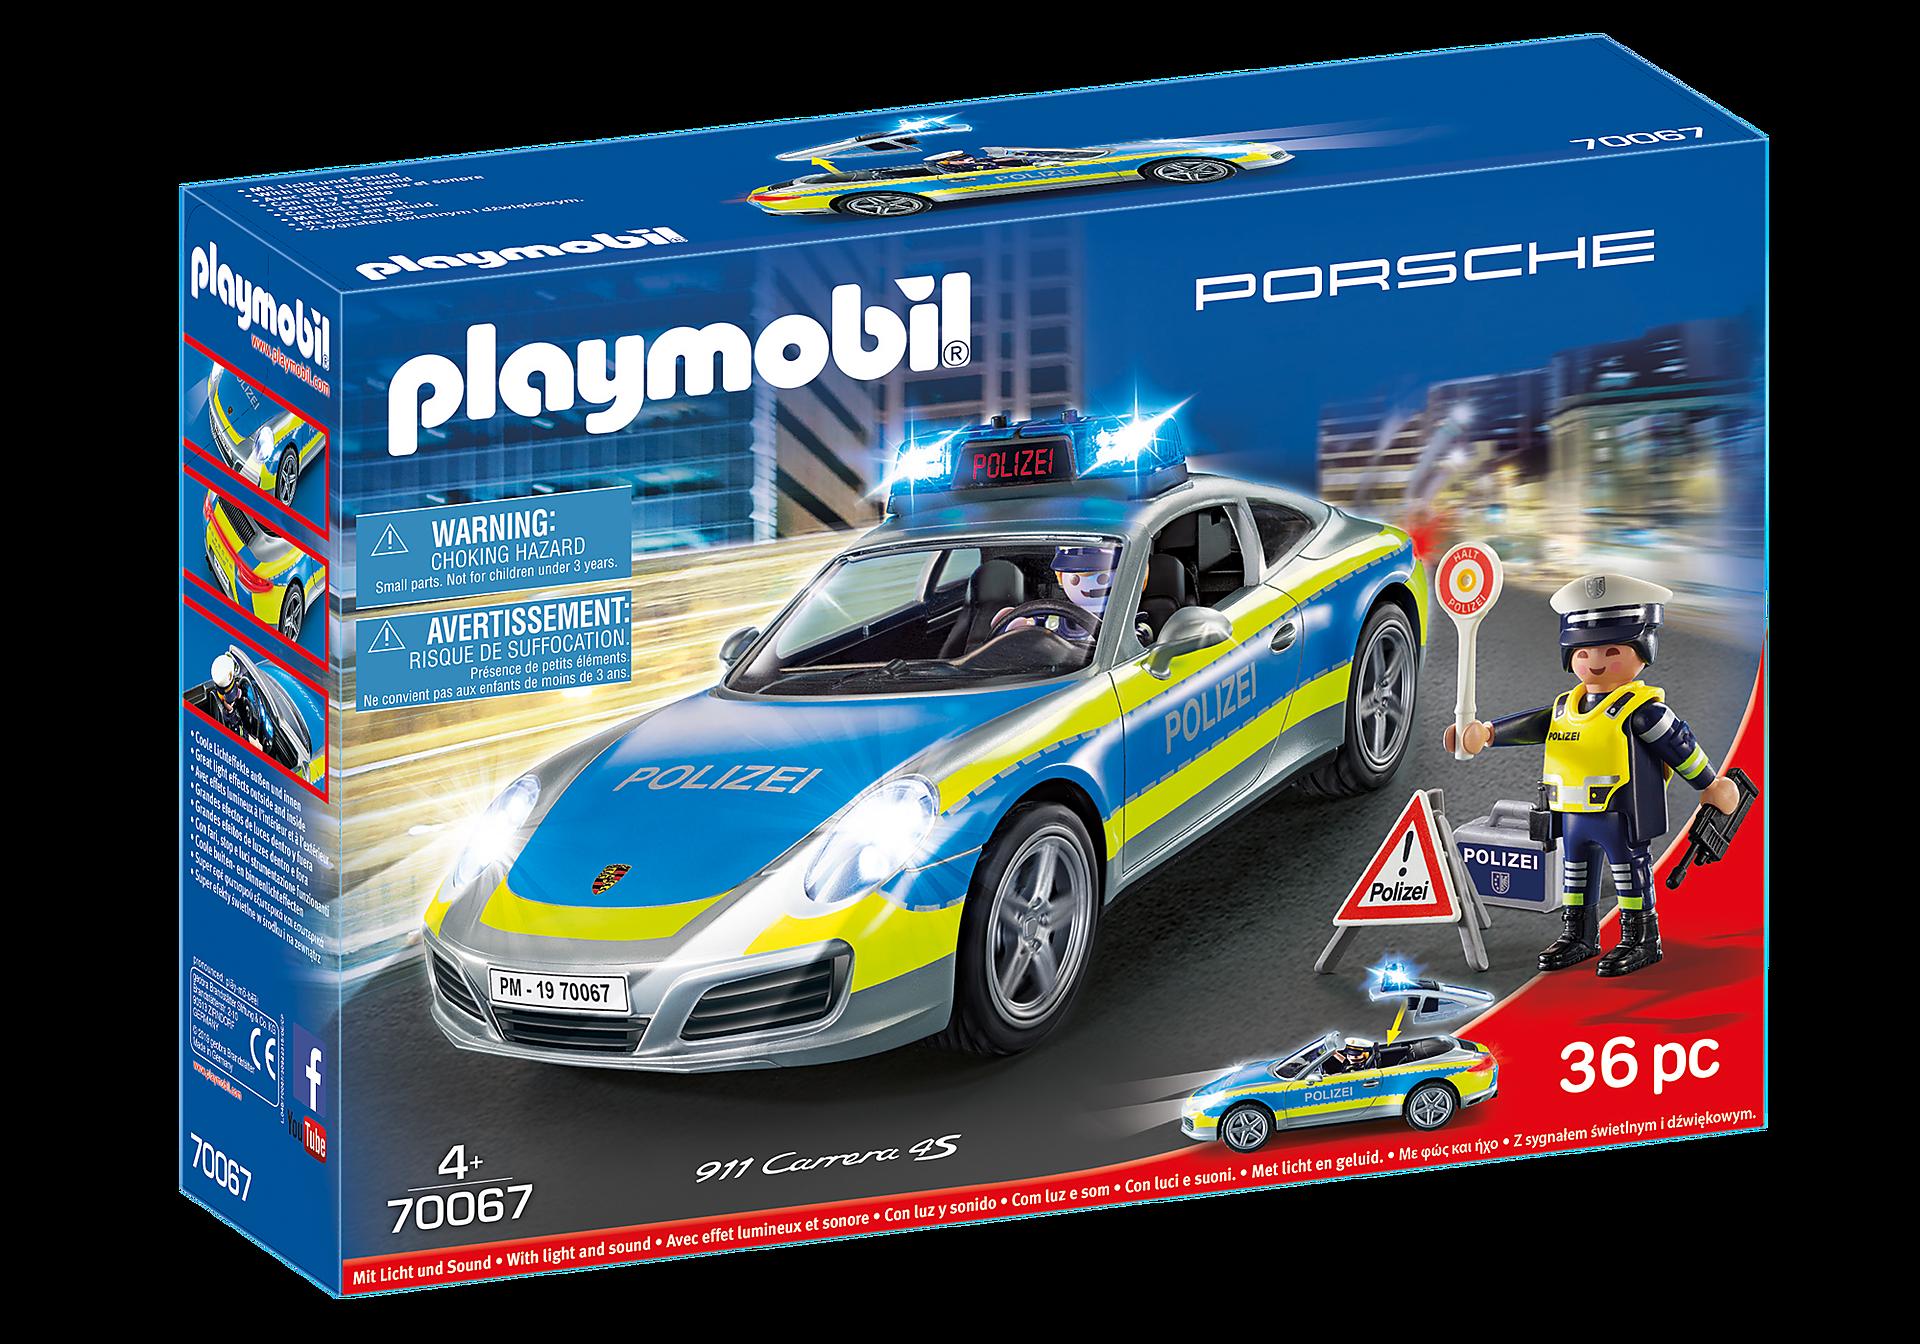 http://media.playmobil.com/i/playmobil/70067_product_box_front/Porsche 911 Carrera 4S Polizei